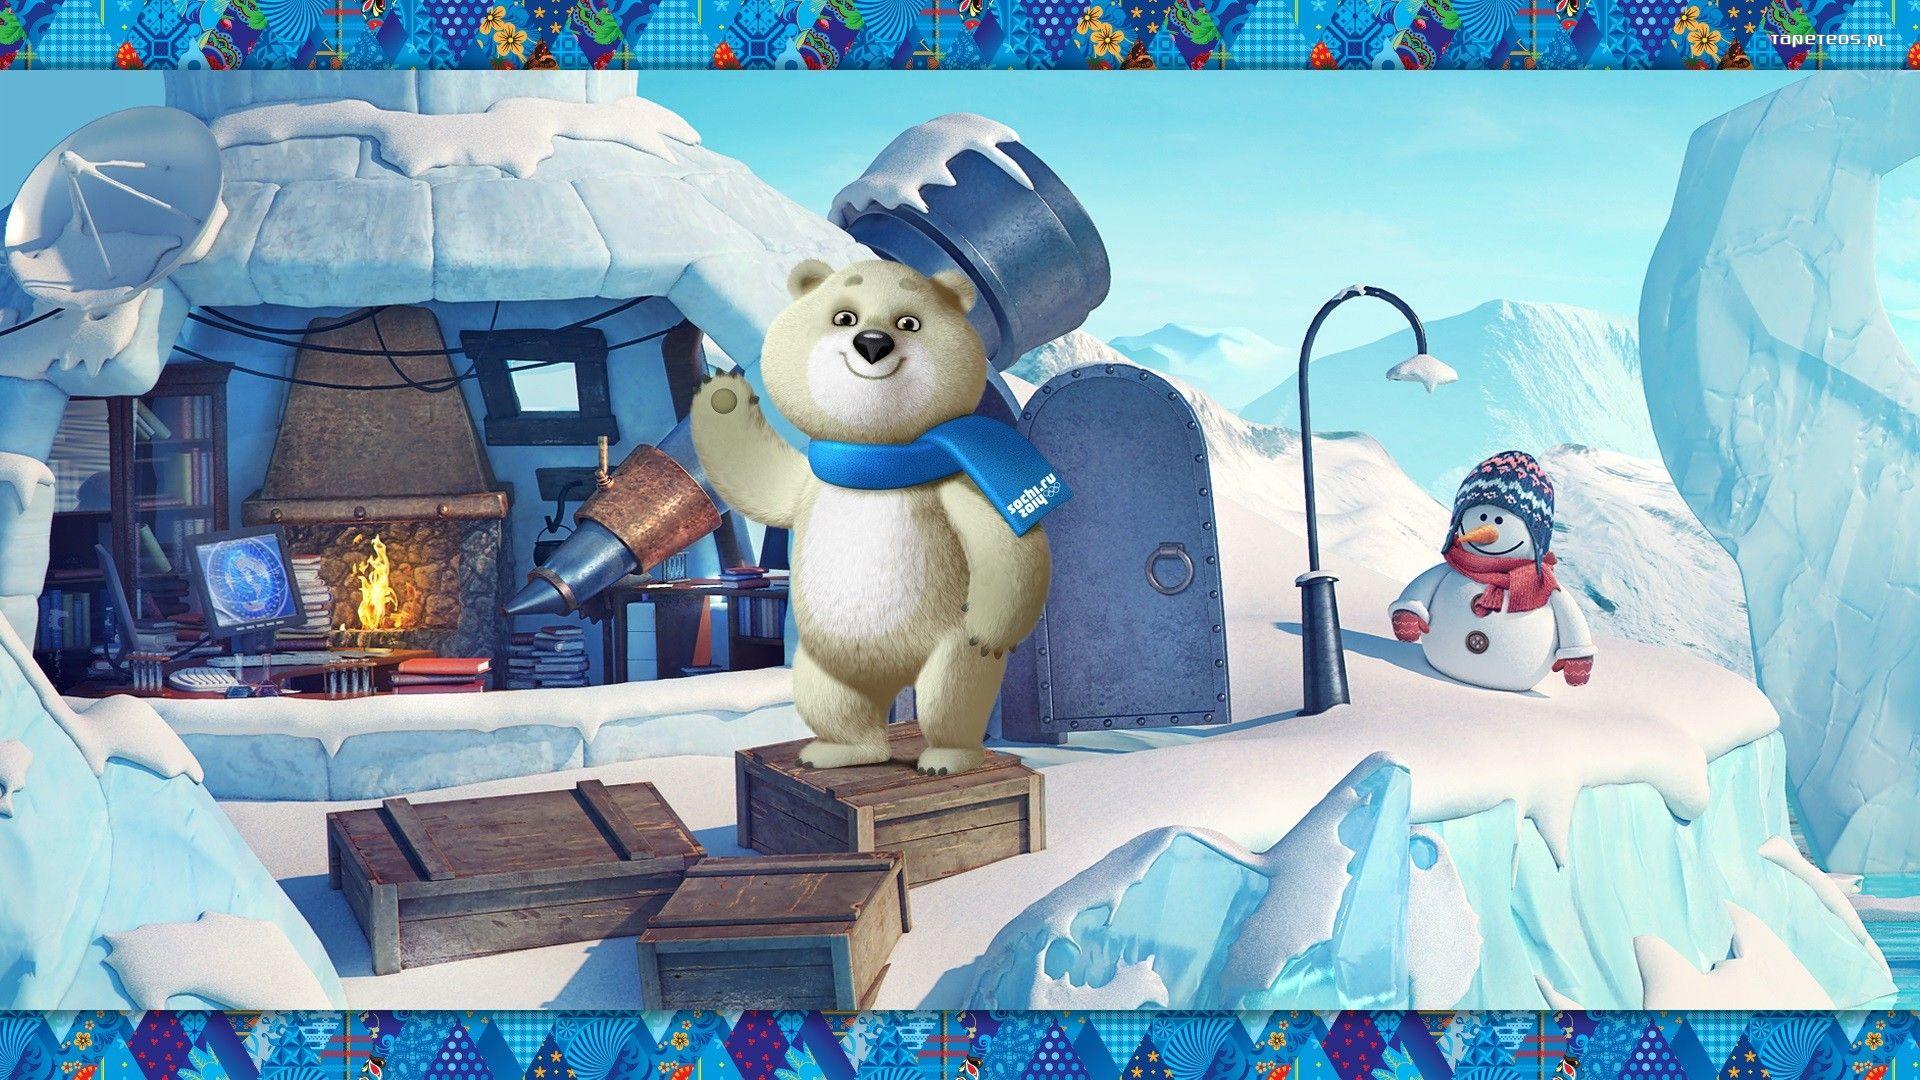 Сочи 2014 Олимпиада олимпийский огонь скачать